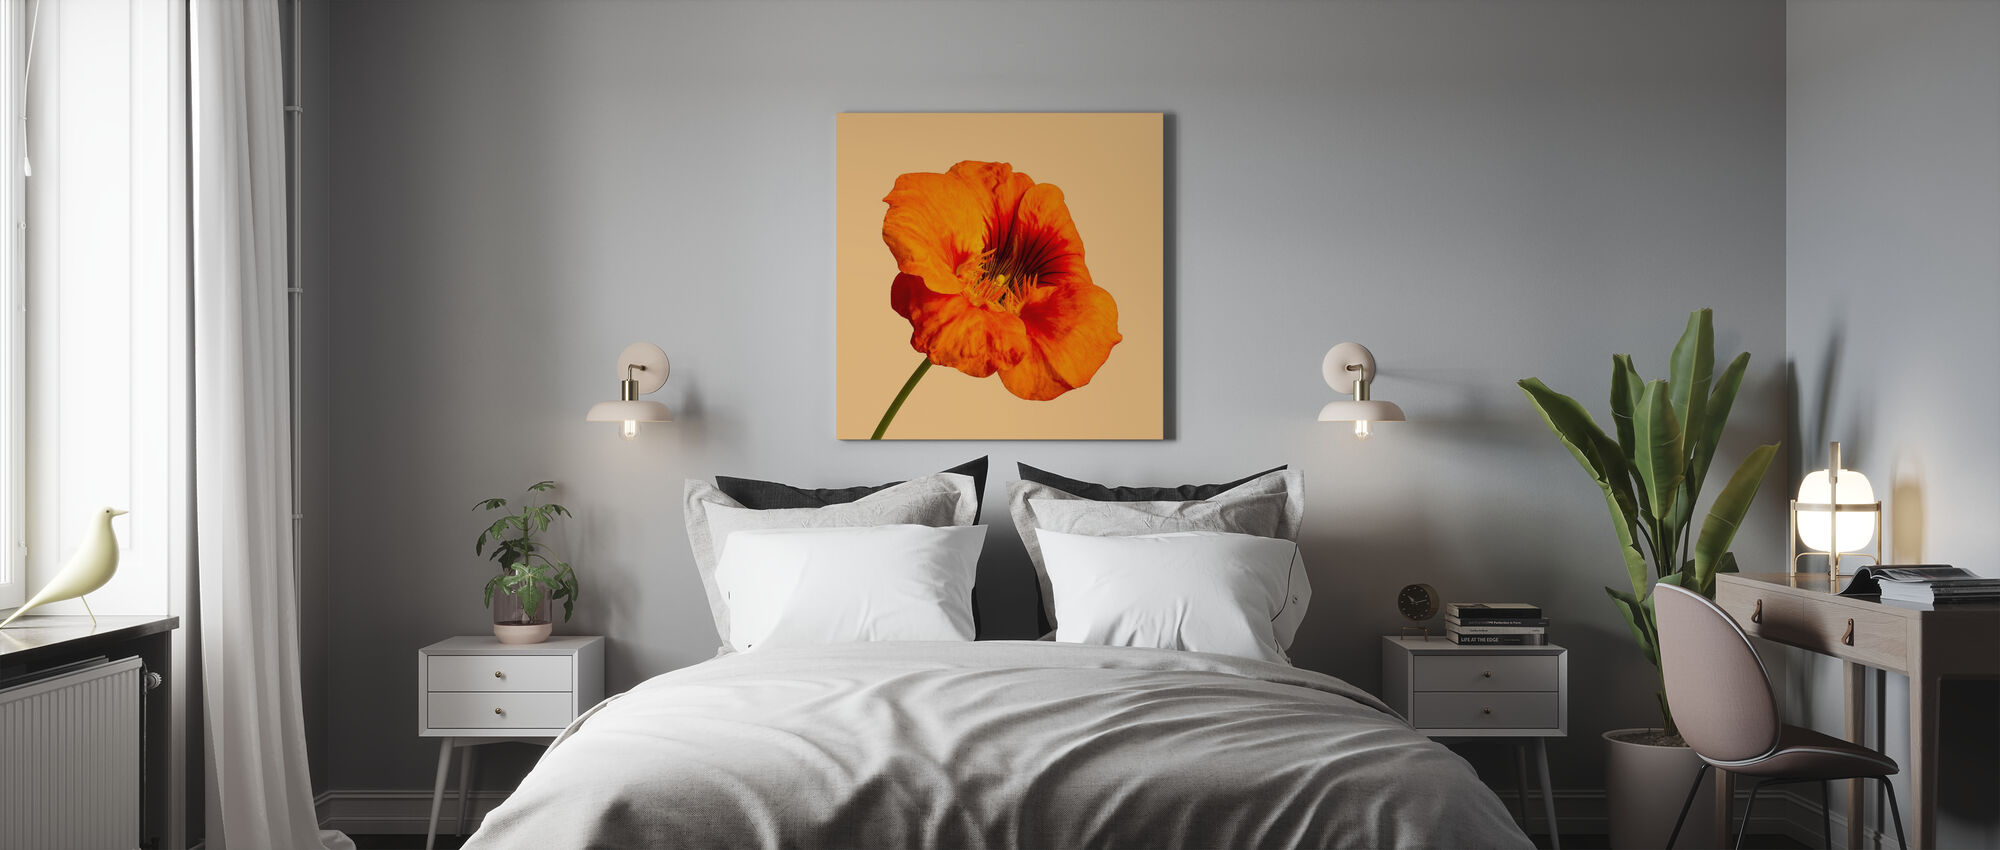 Blomstrende Hibiscus - Lerretsbilde - Soverom